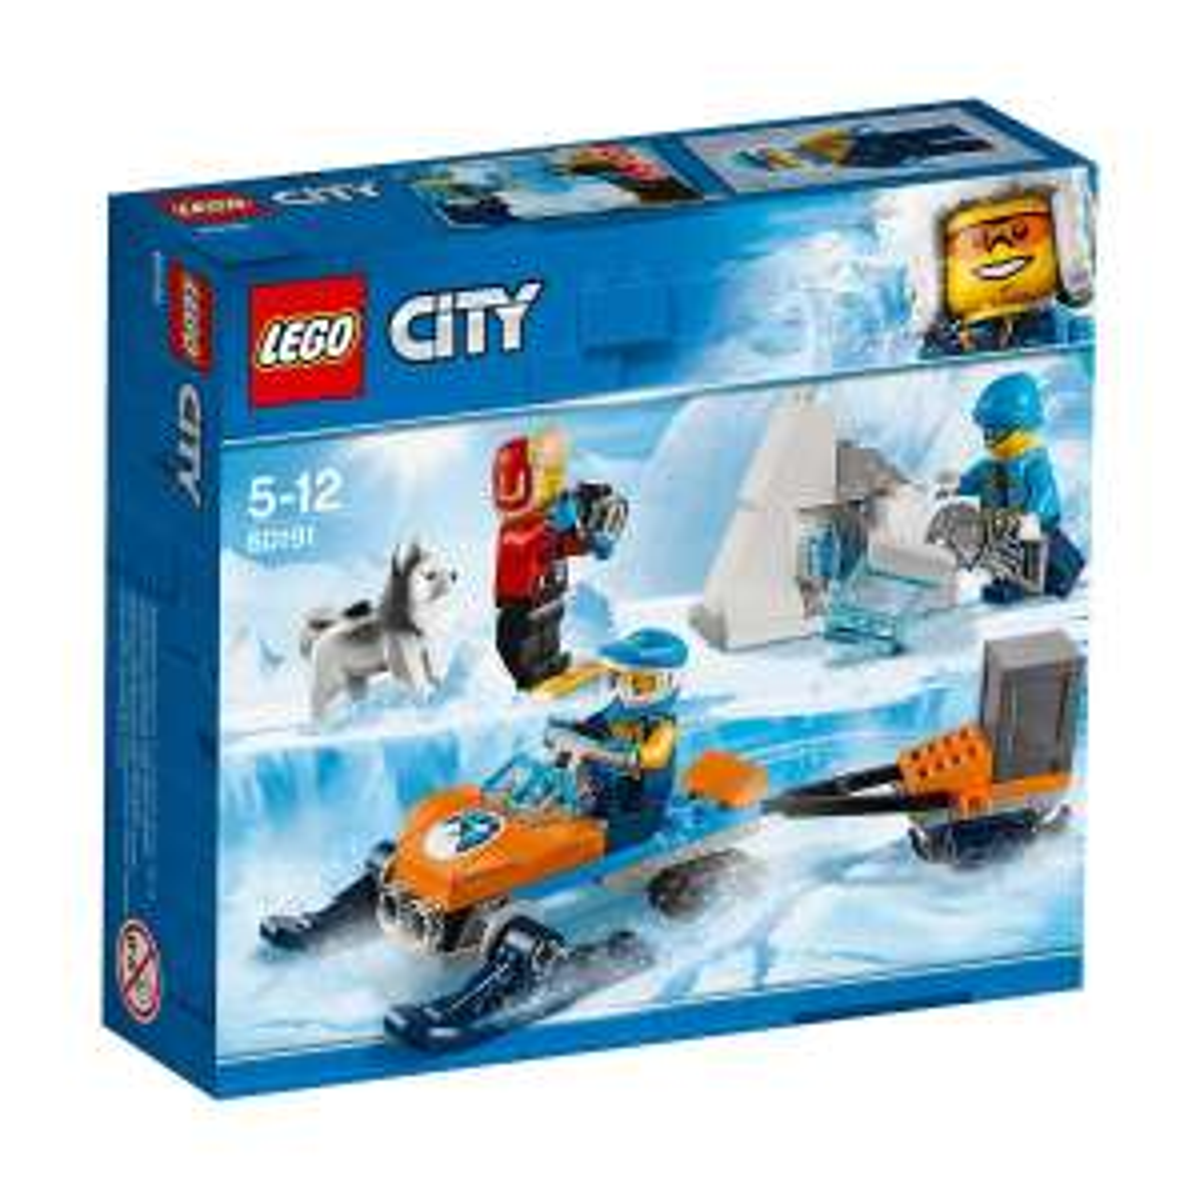 Arctic Exploration Team Lego City 60191 Tesco Liverpool - £3 instore